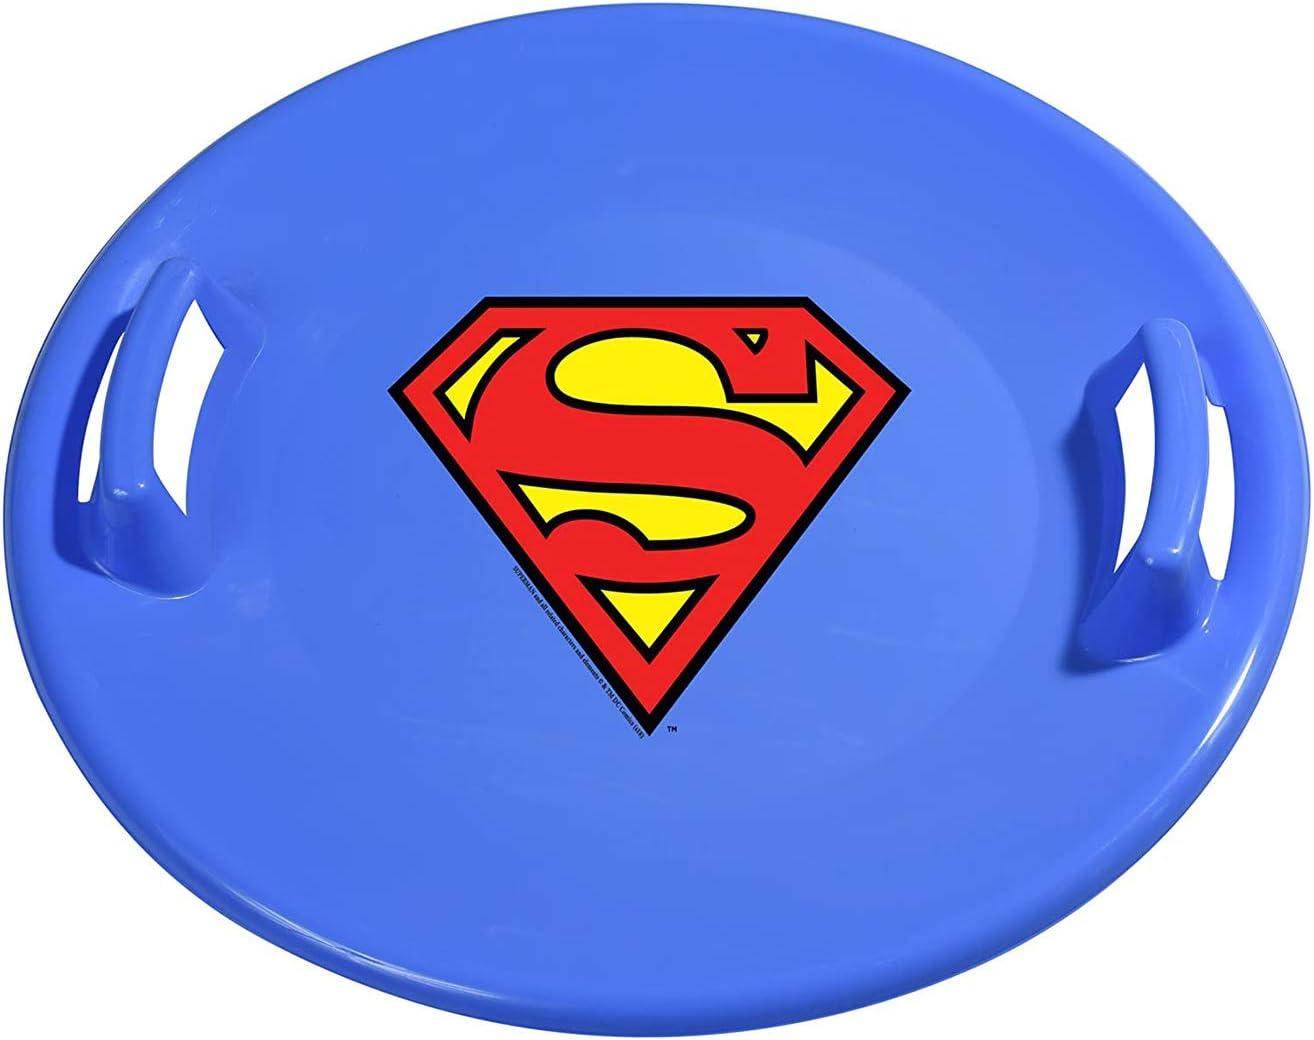 Slippery Racer Downhill Pro Superman Adults Superlatite Plastic Kids and Sau Indefinitely